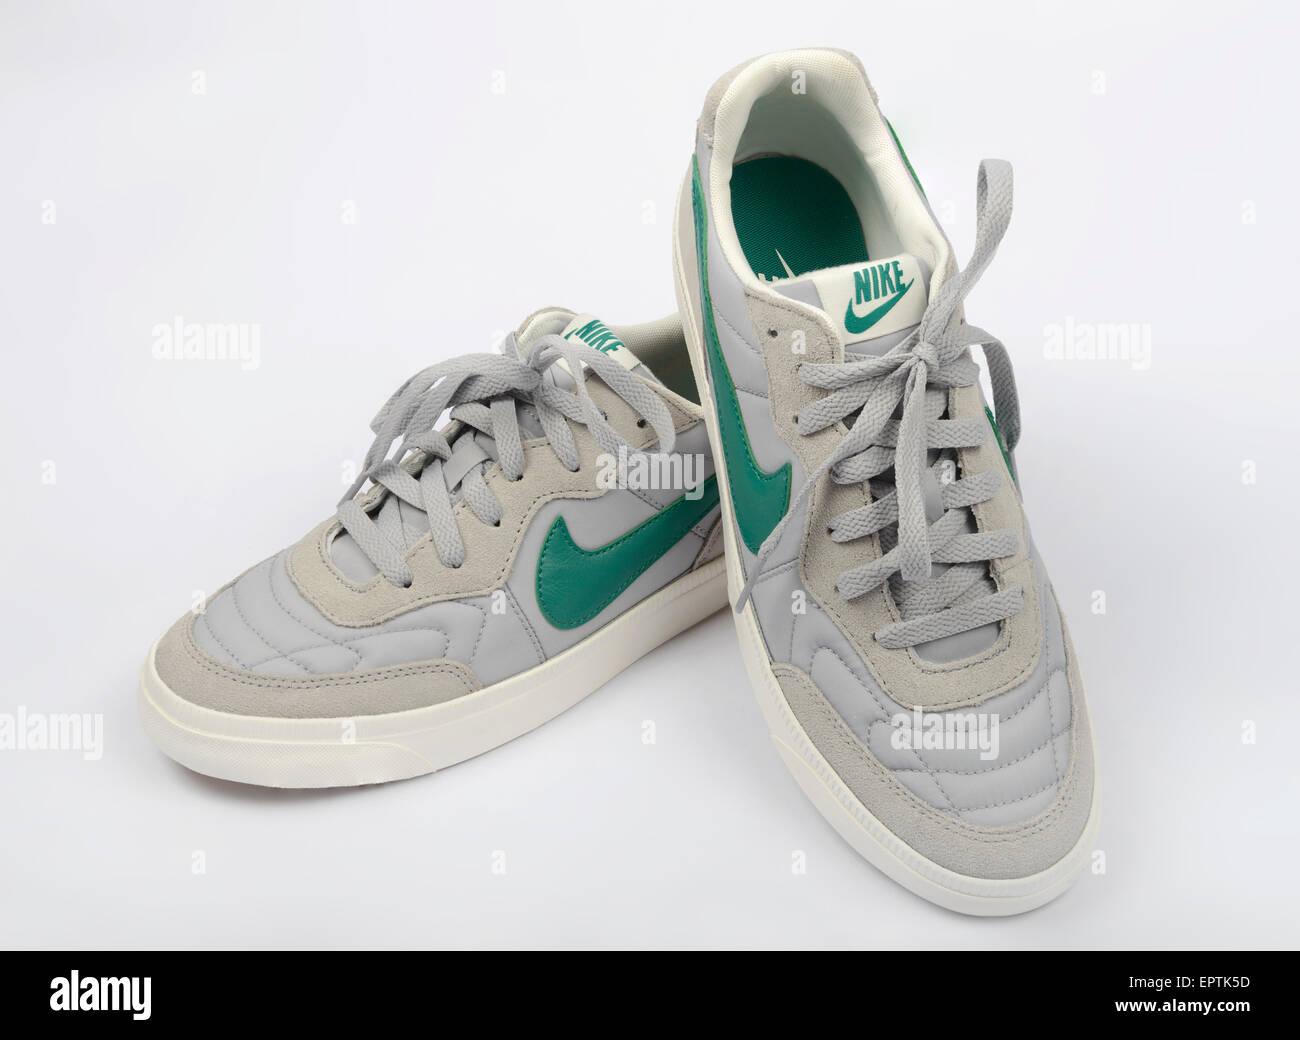 One pair of Nike walking shoe featuring